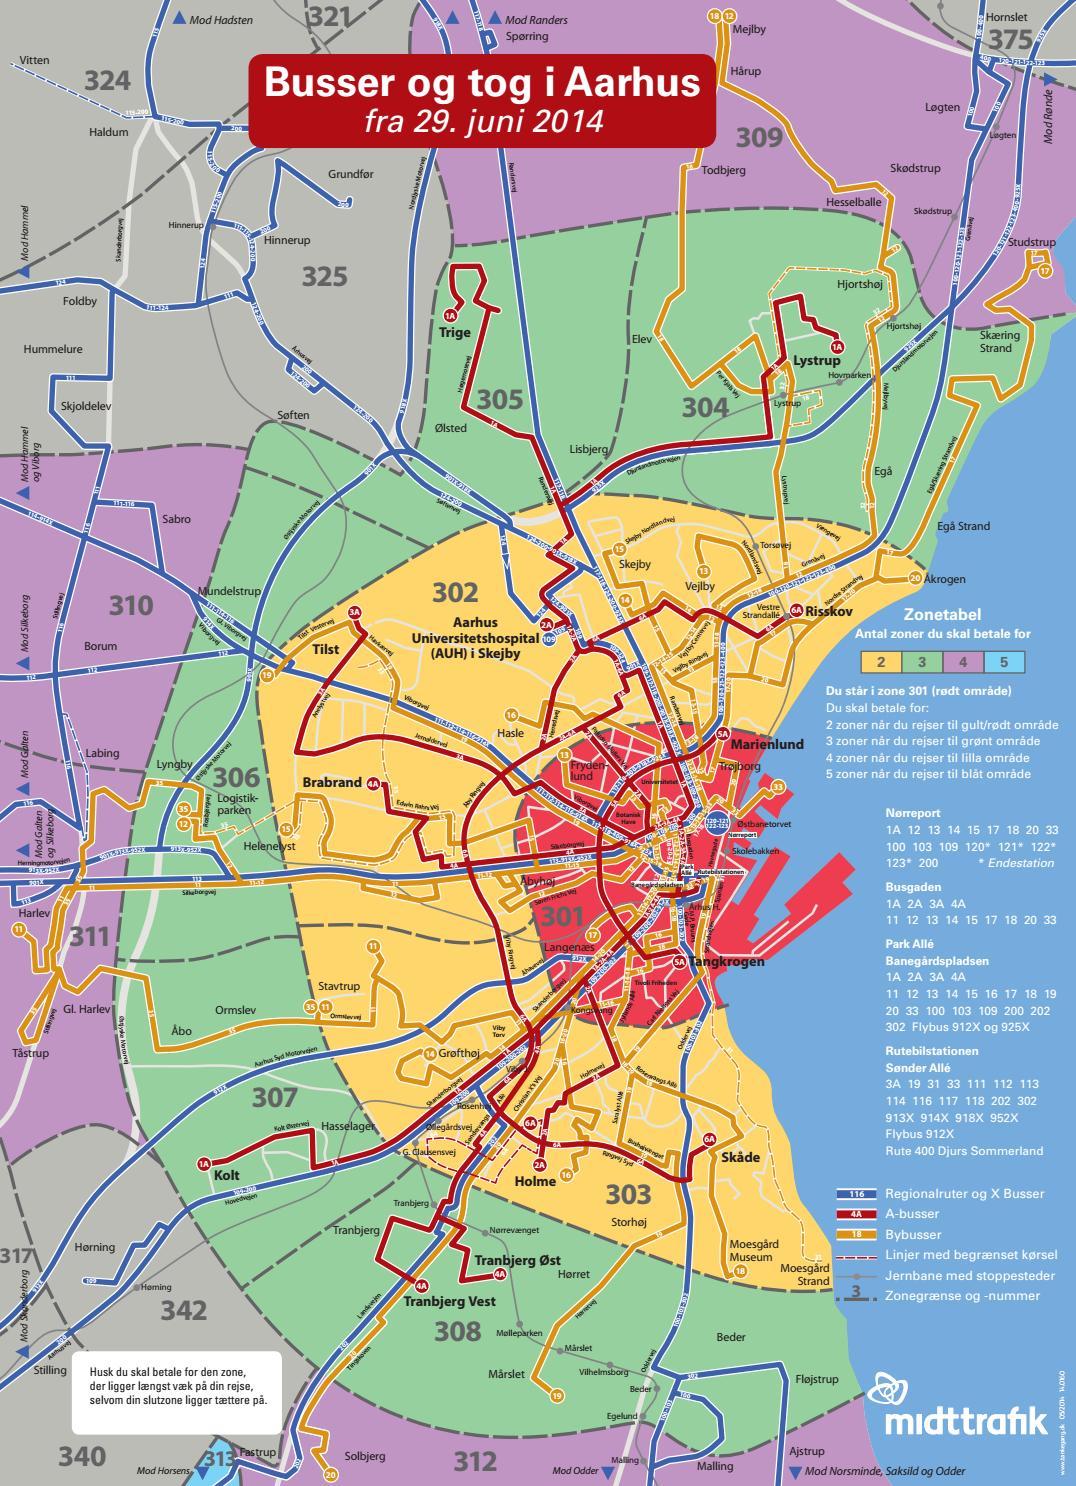 Midttrafik zonekort Midttrafik